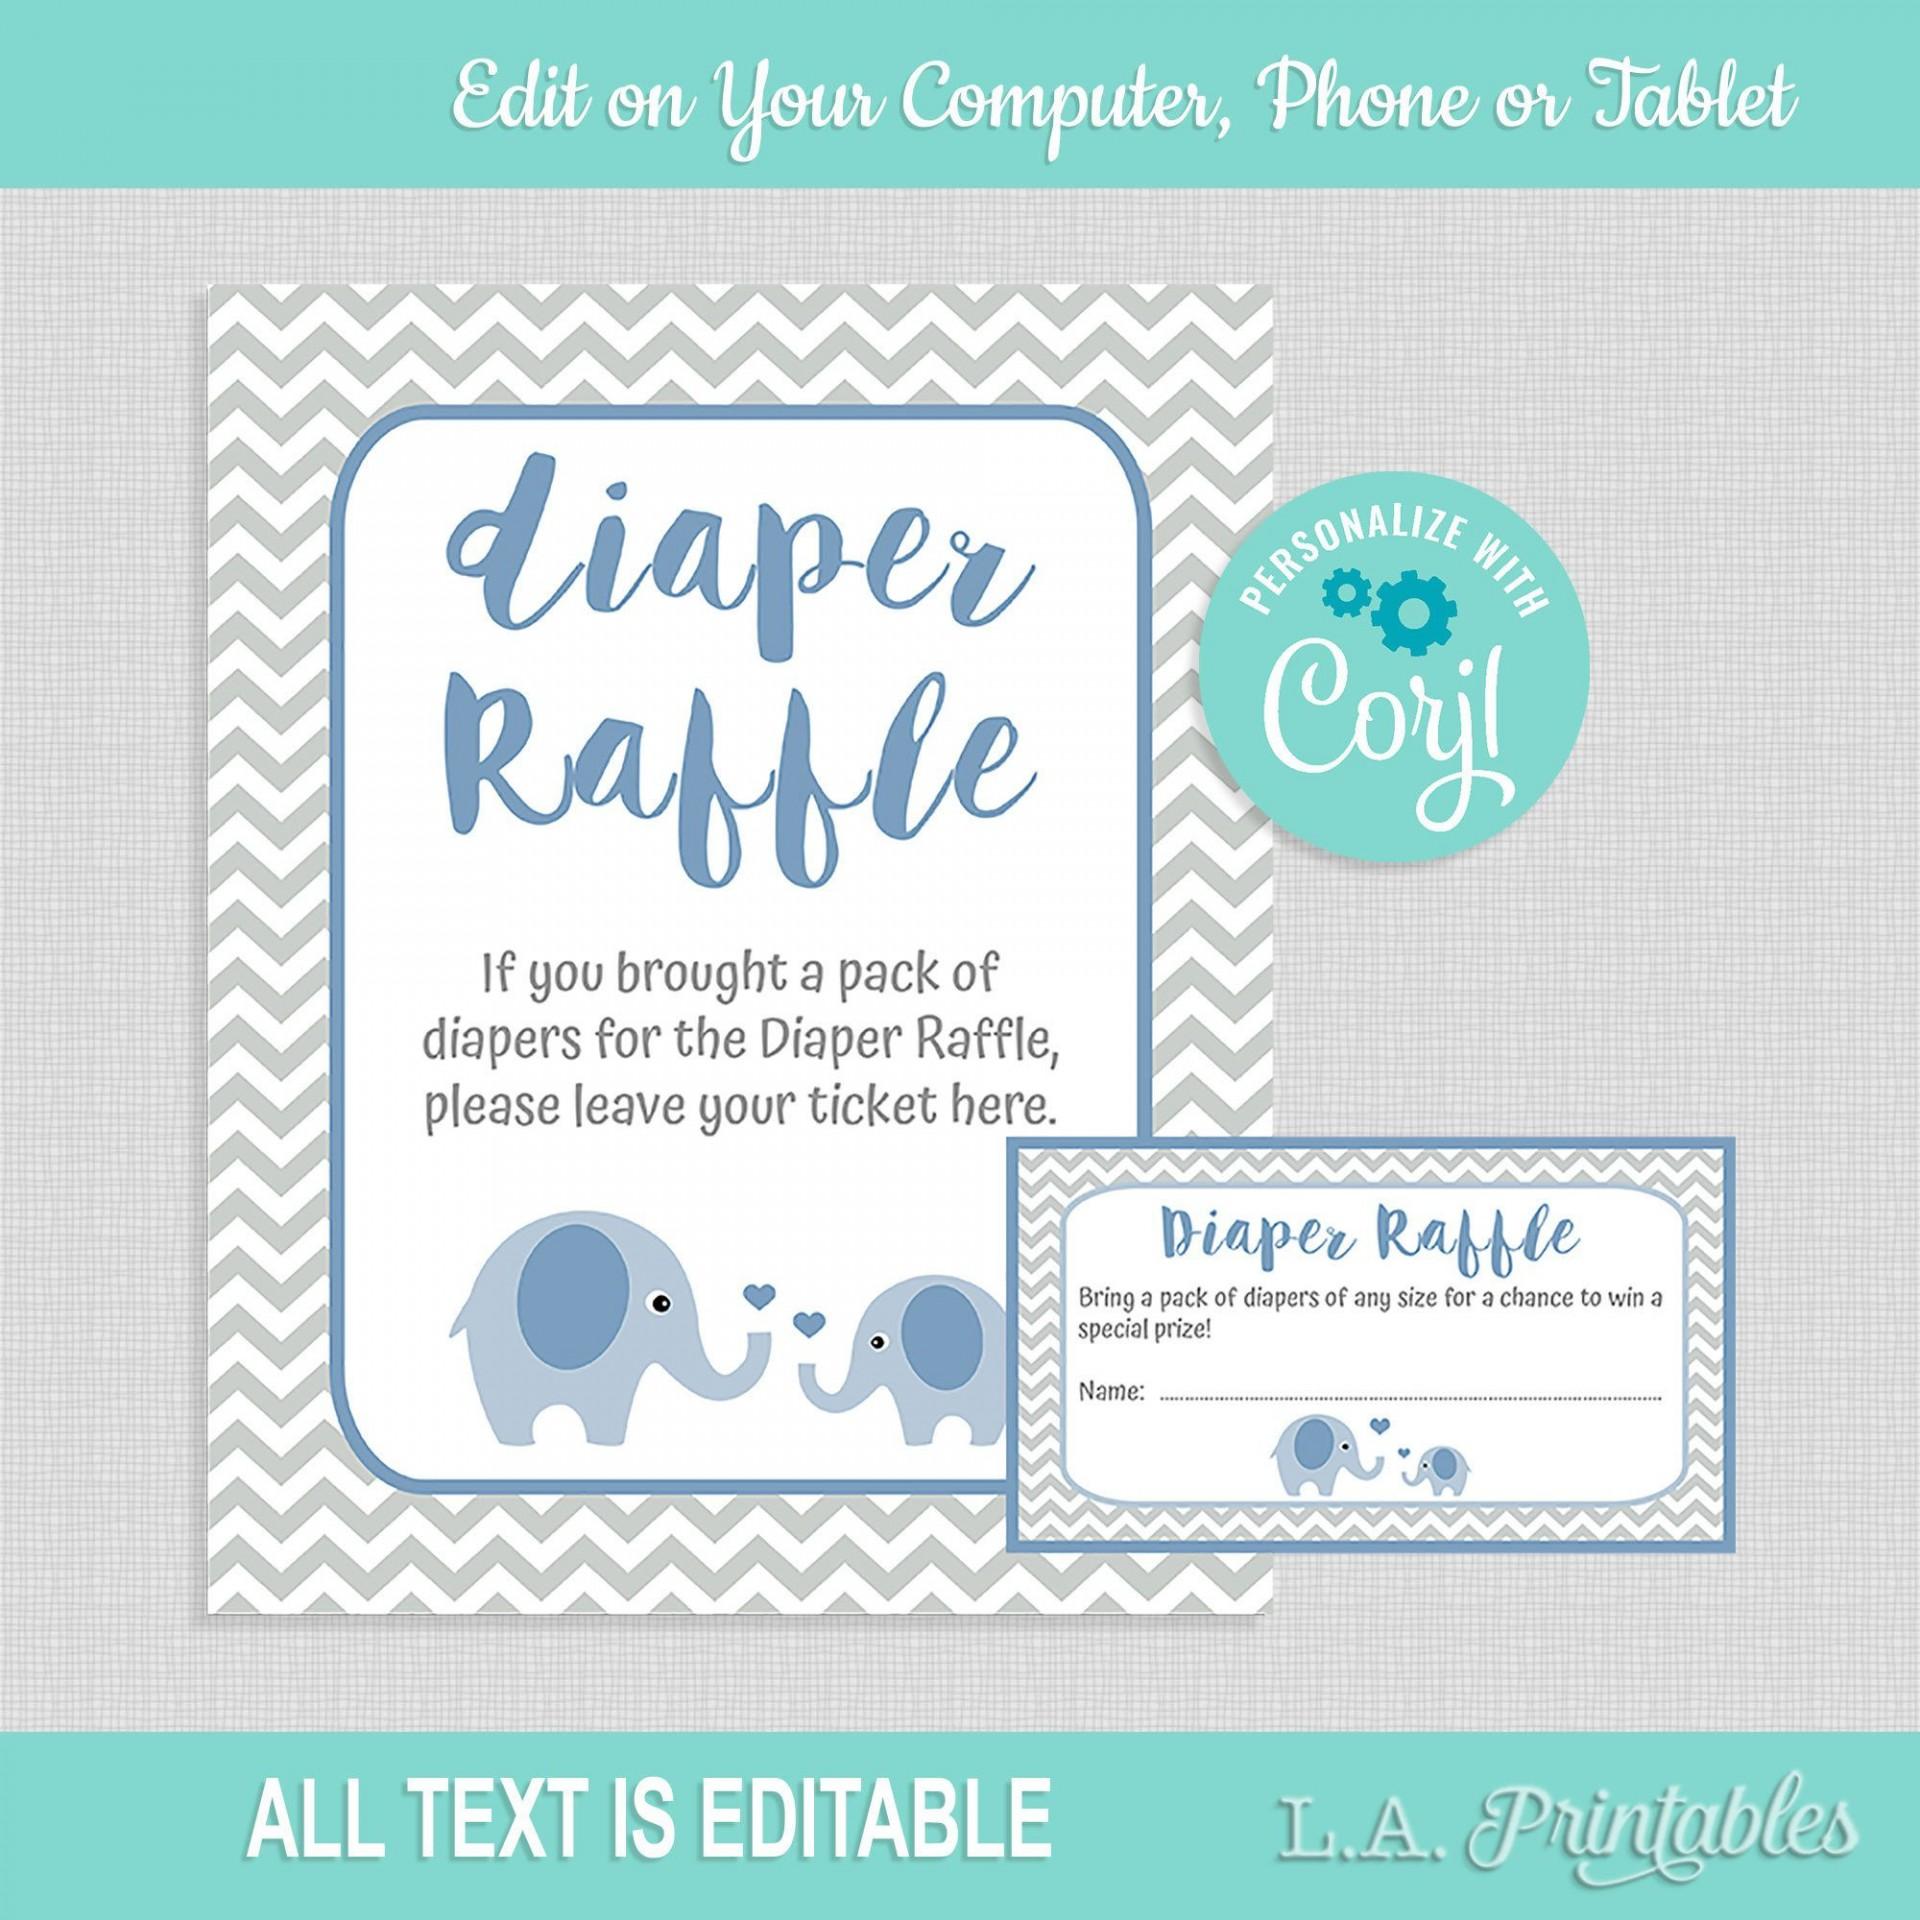 005 Singular Diaper Raffle Ticket Template High Definition  Boy Free Printable Print Black And White1920